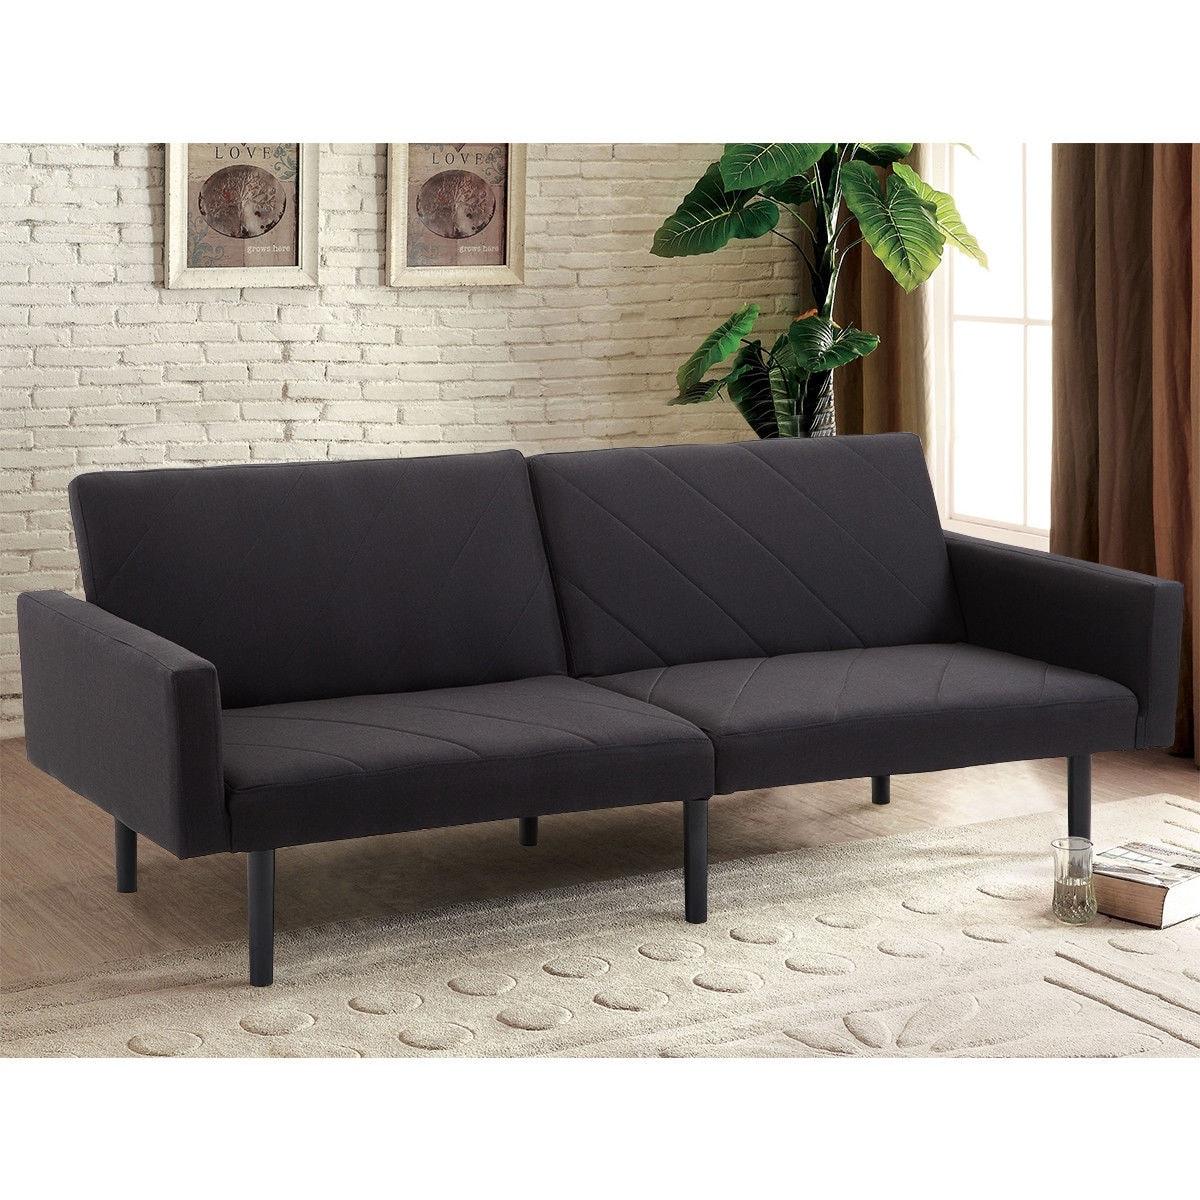 Costway Futon Sofa Bed Convertible Recliner Couch Splitback Sleeper w/Wood  Legs Black